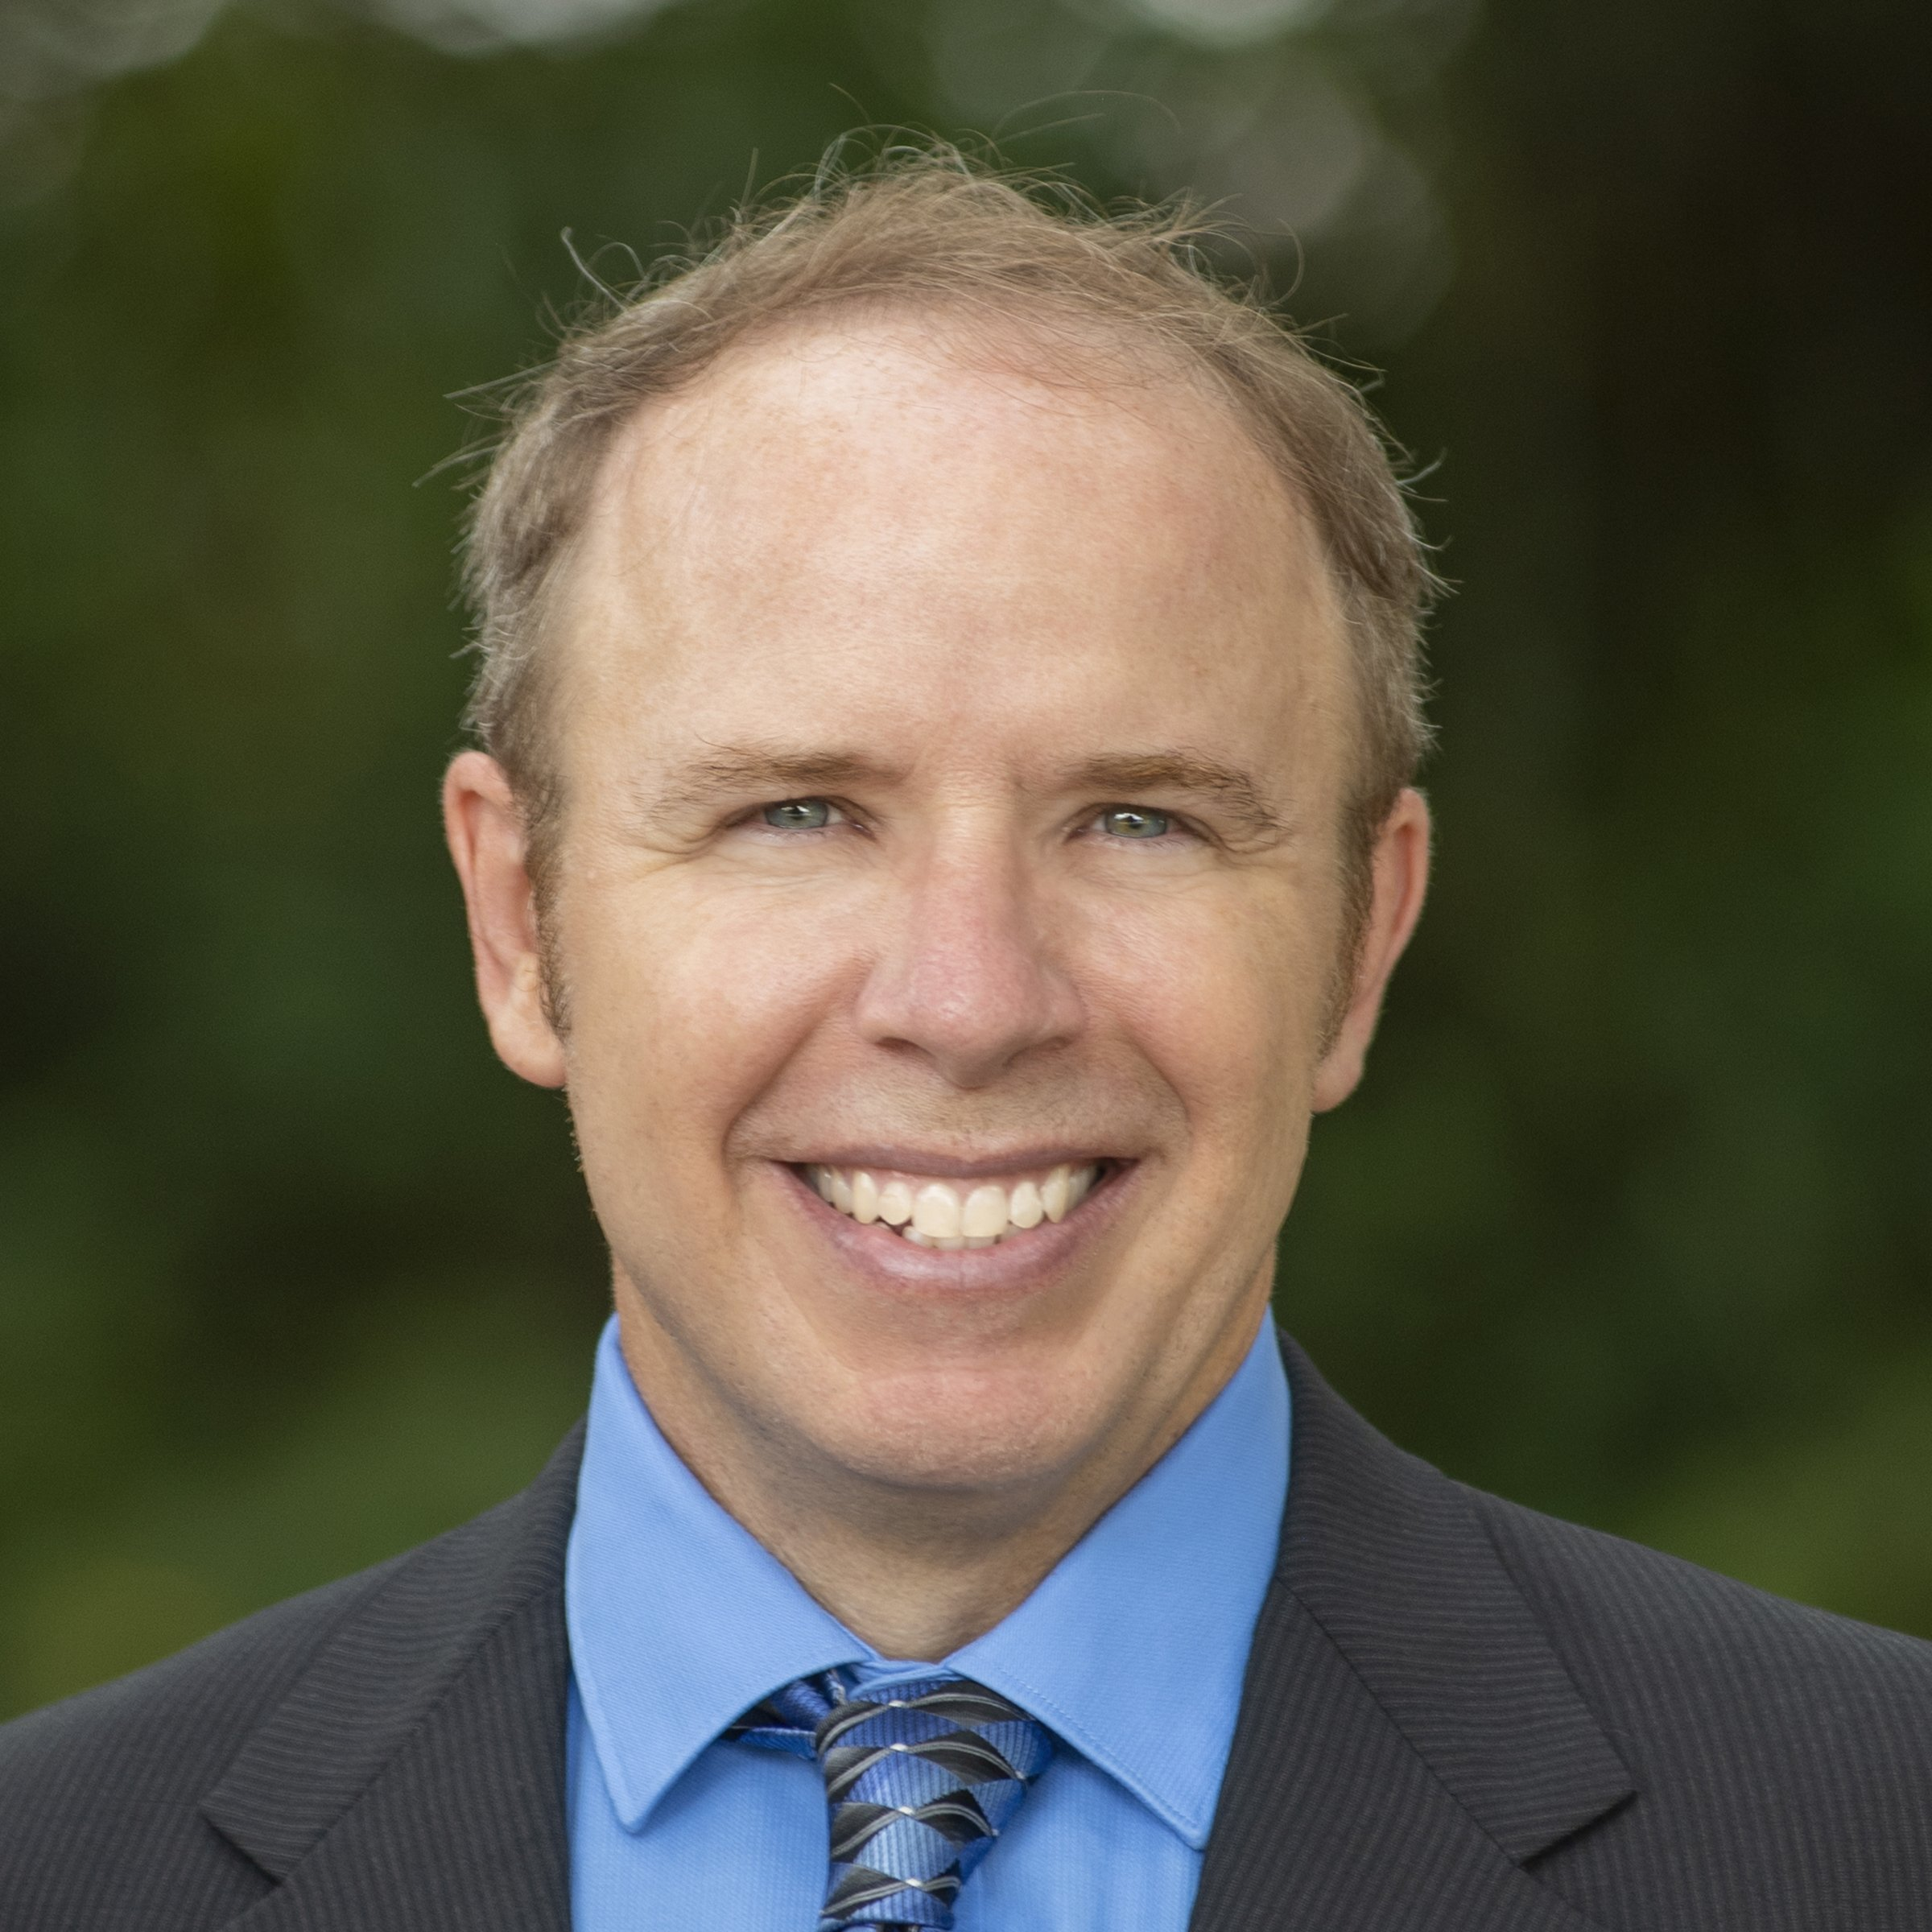 Attorney John Terrel